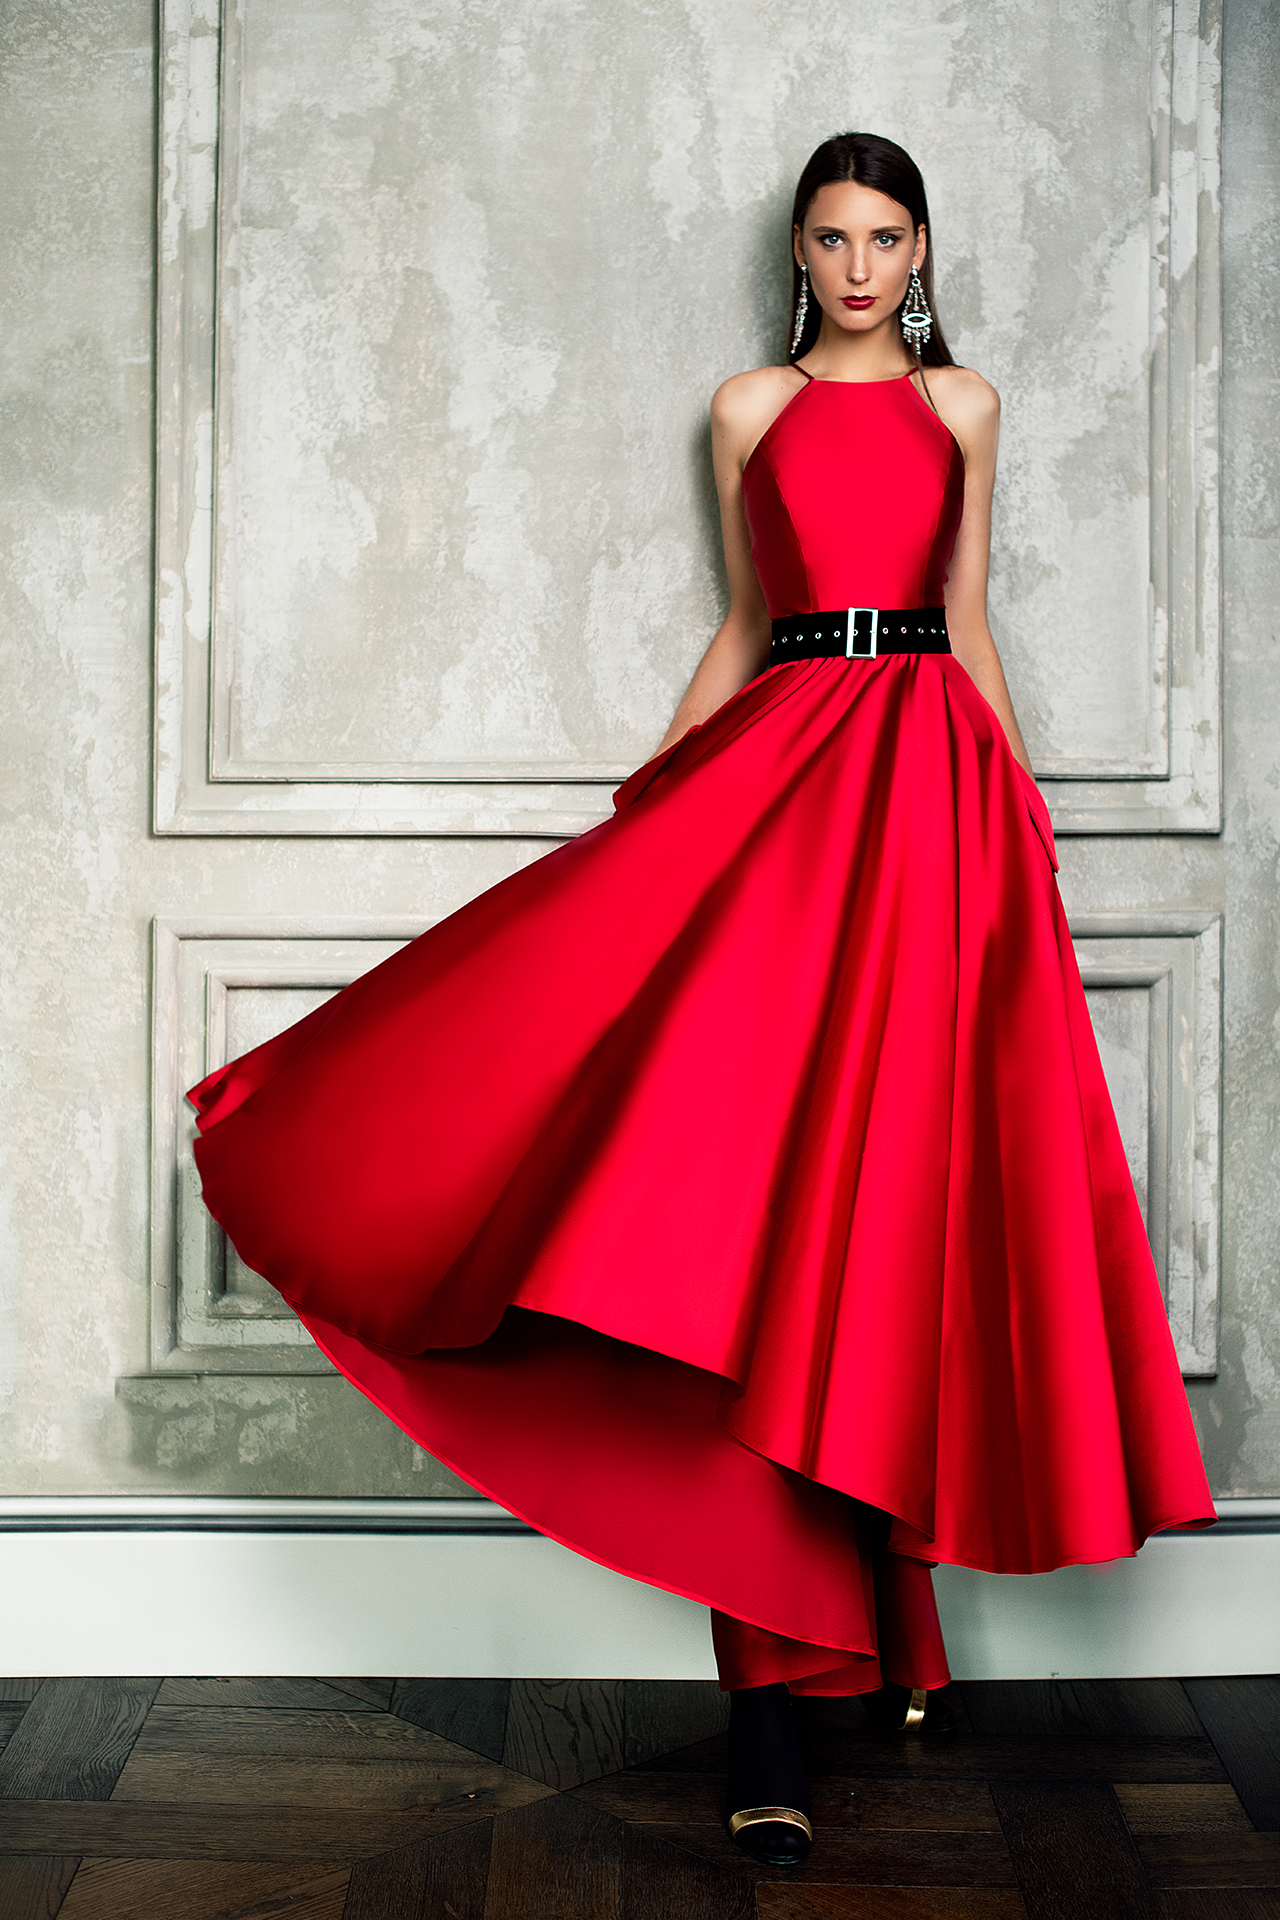 Evening dresses №1361-1 Silhouette  A Line  Color  Red  Neckline  Halter  Sleeves  Sleeveless  Train  No train